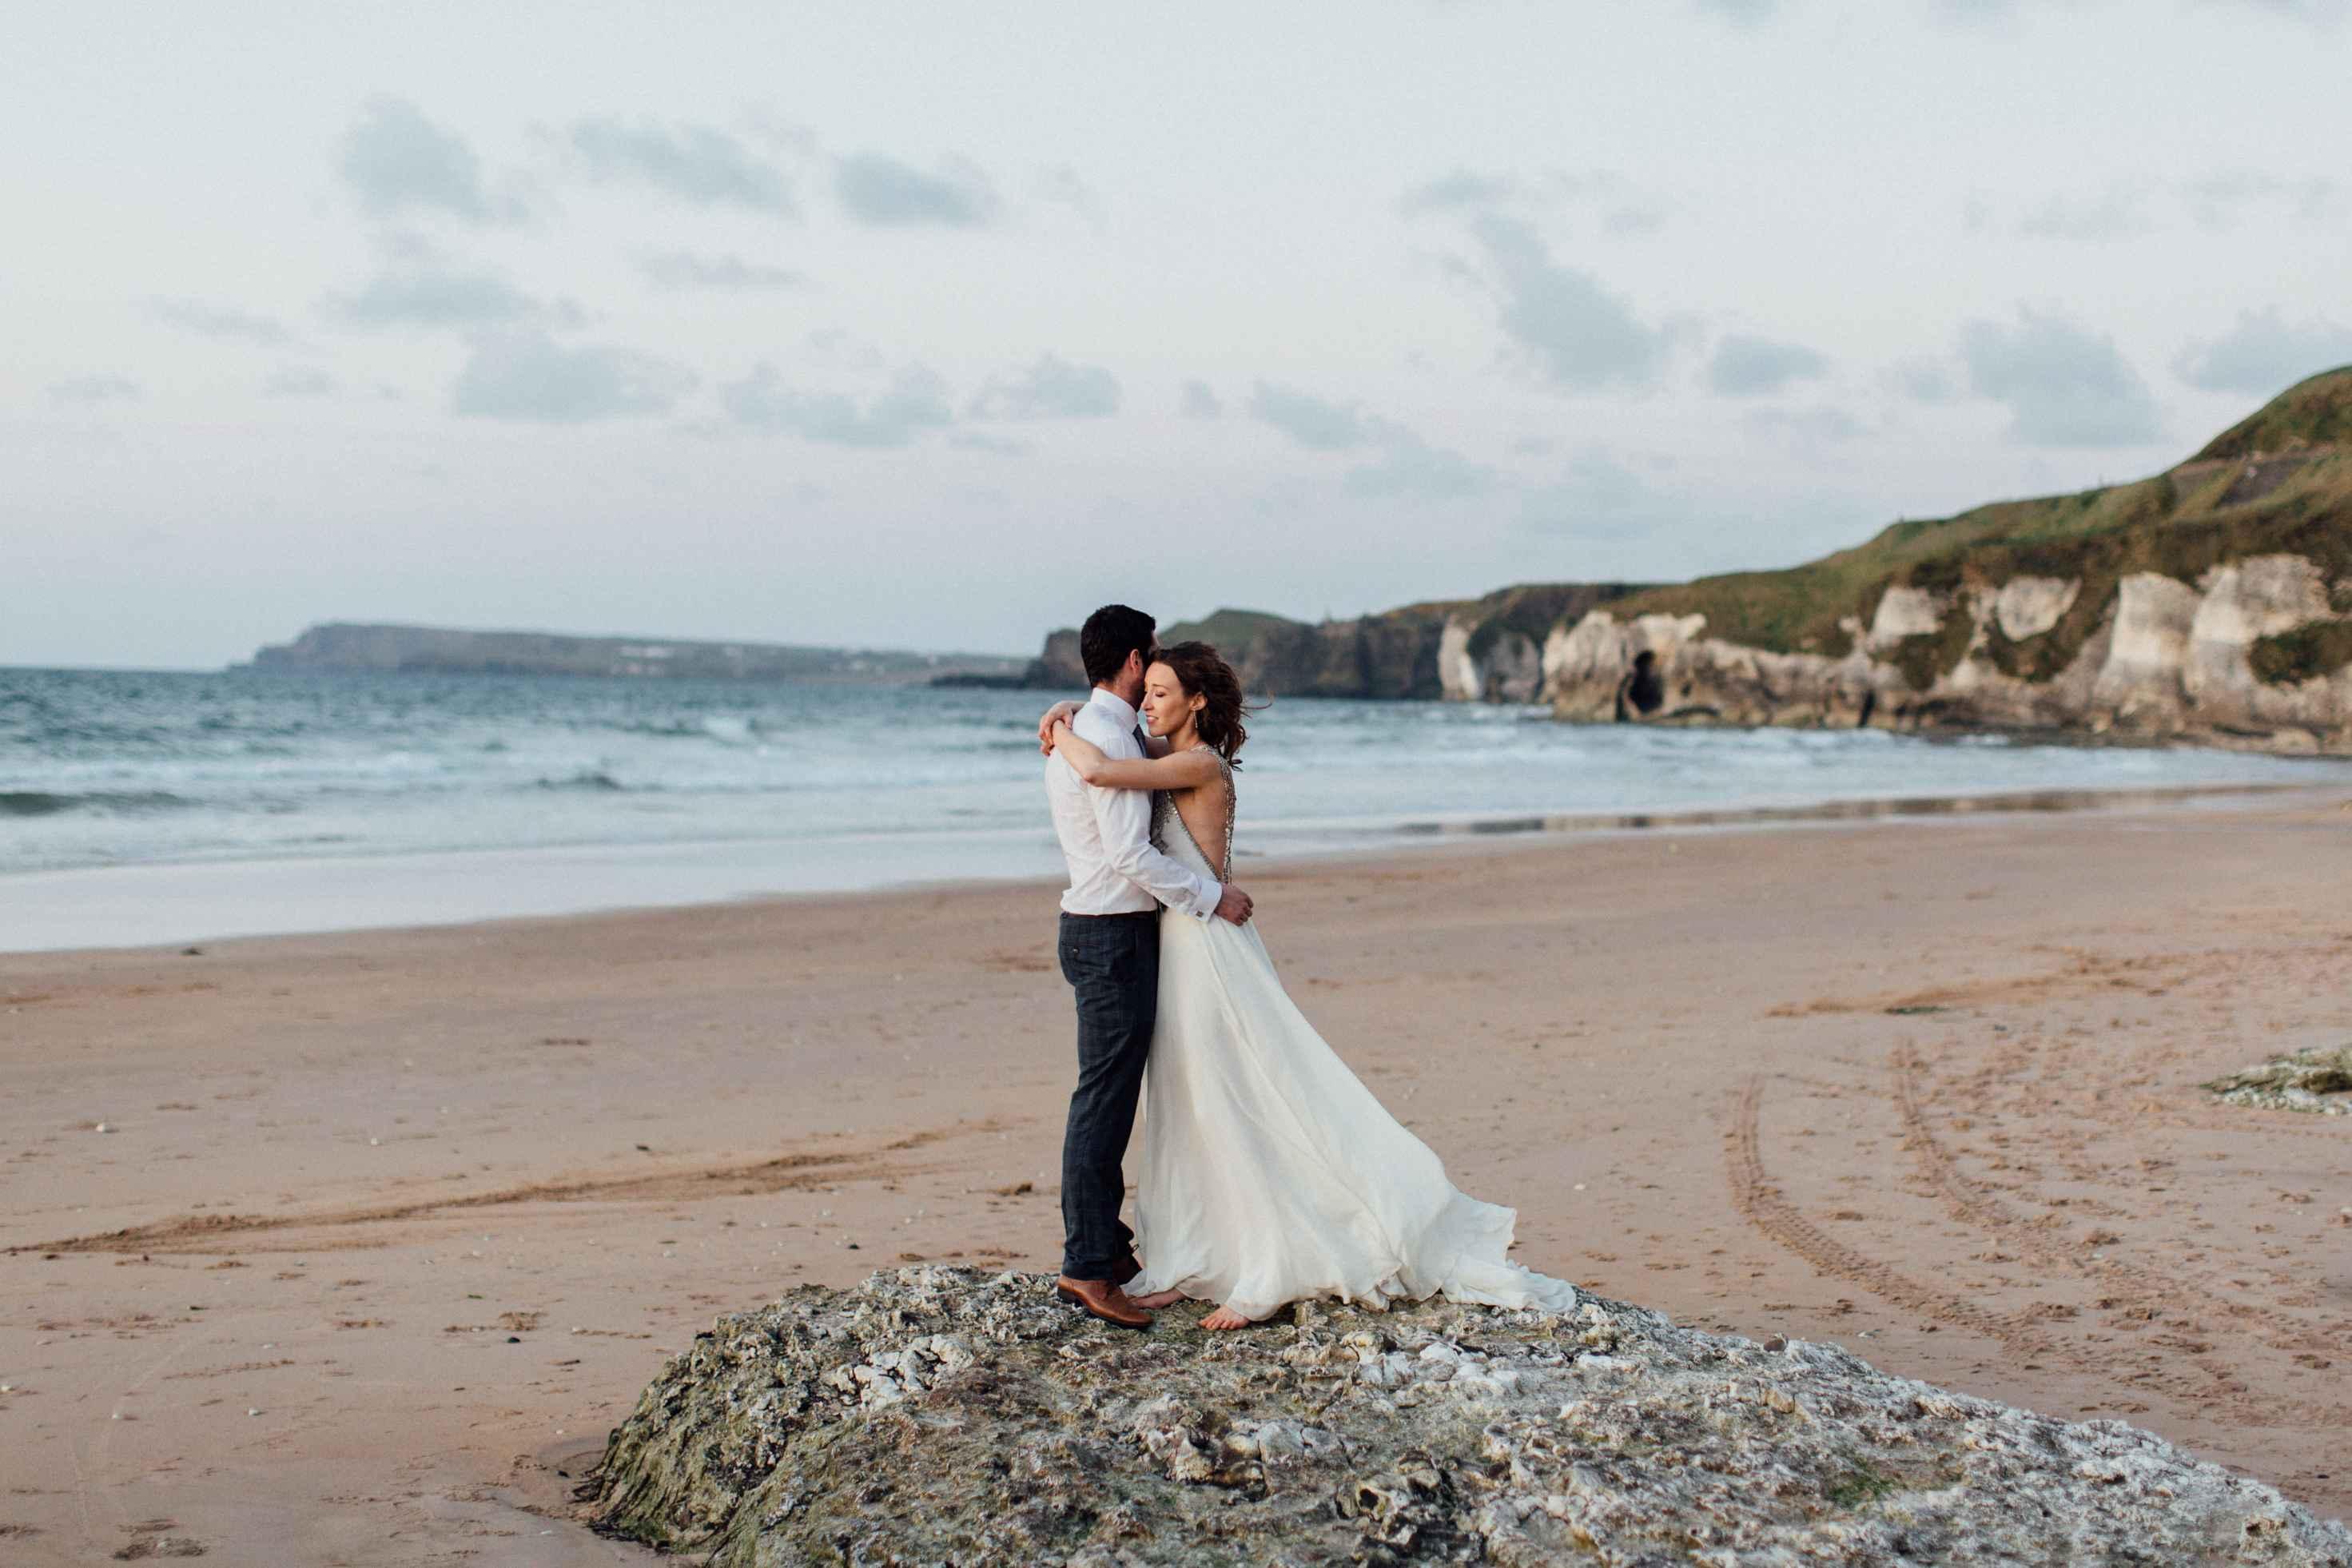 peter-carvill-weddings-fine-art-white-rocks-beach_0209